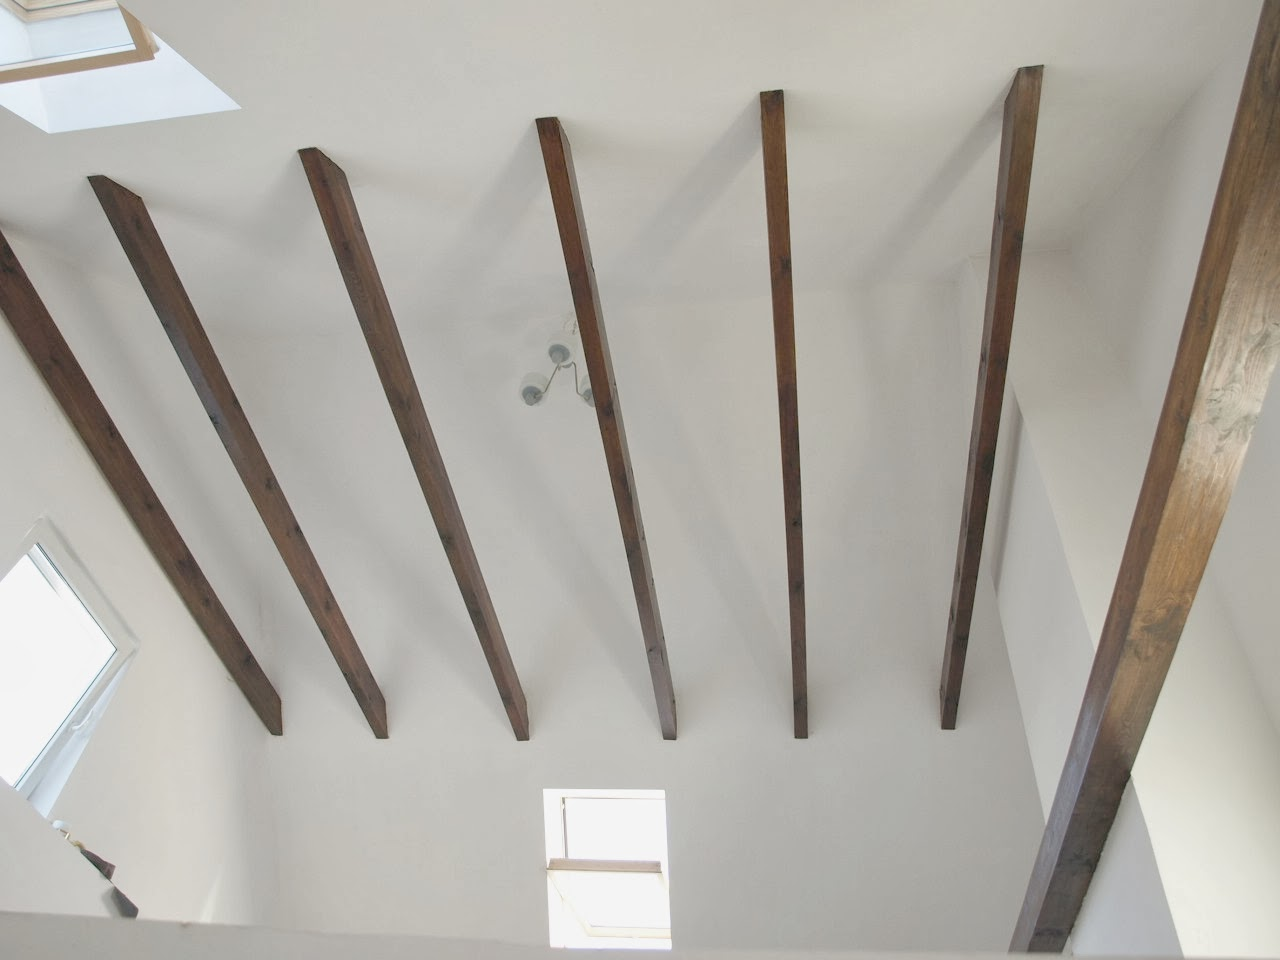 remont starego domu poddasze belki strop dach murator